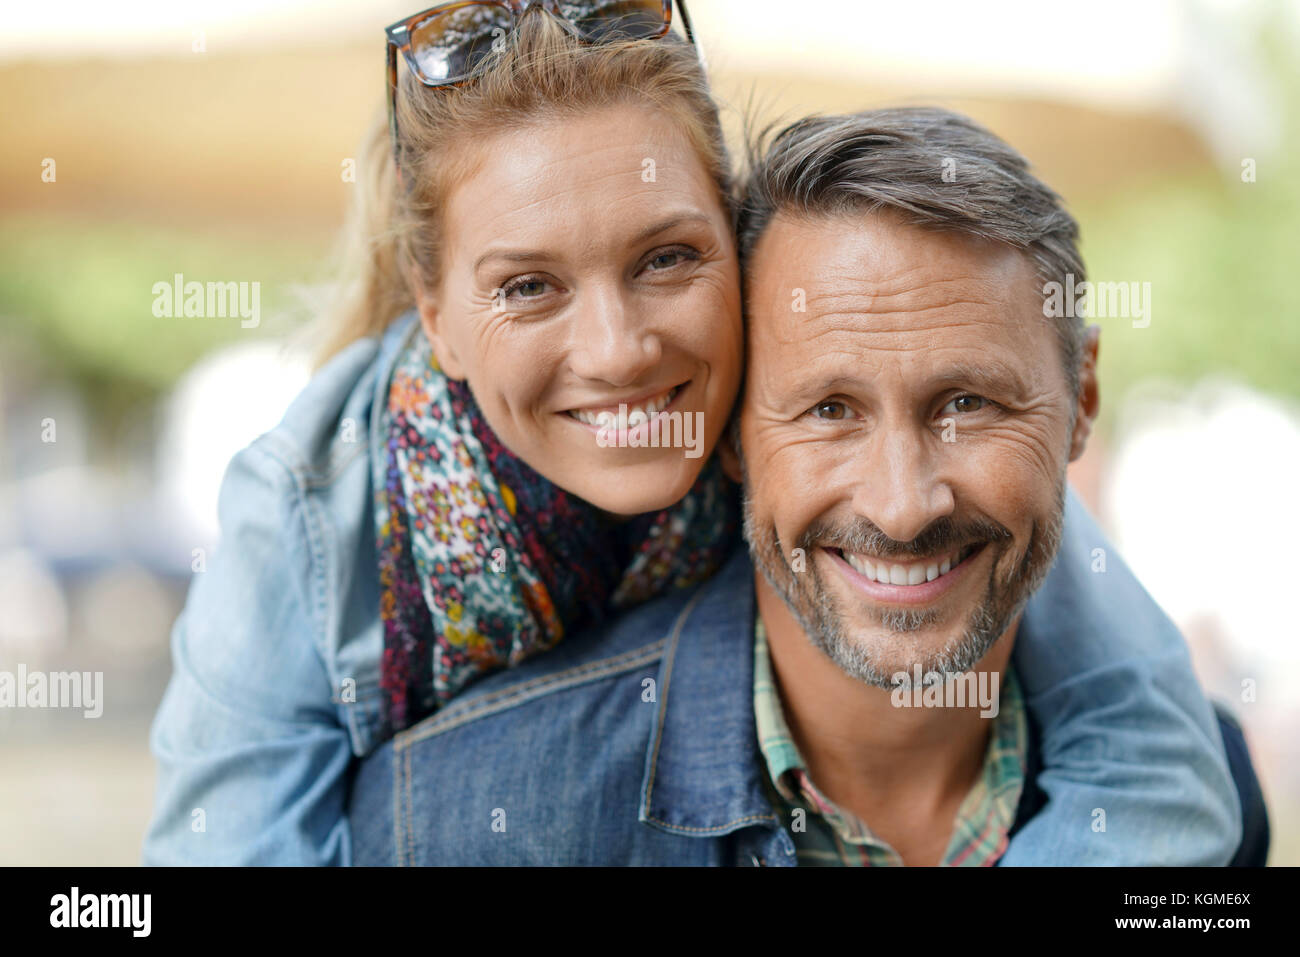 Man giving piggyback ride to woman - Stock Image